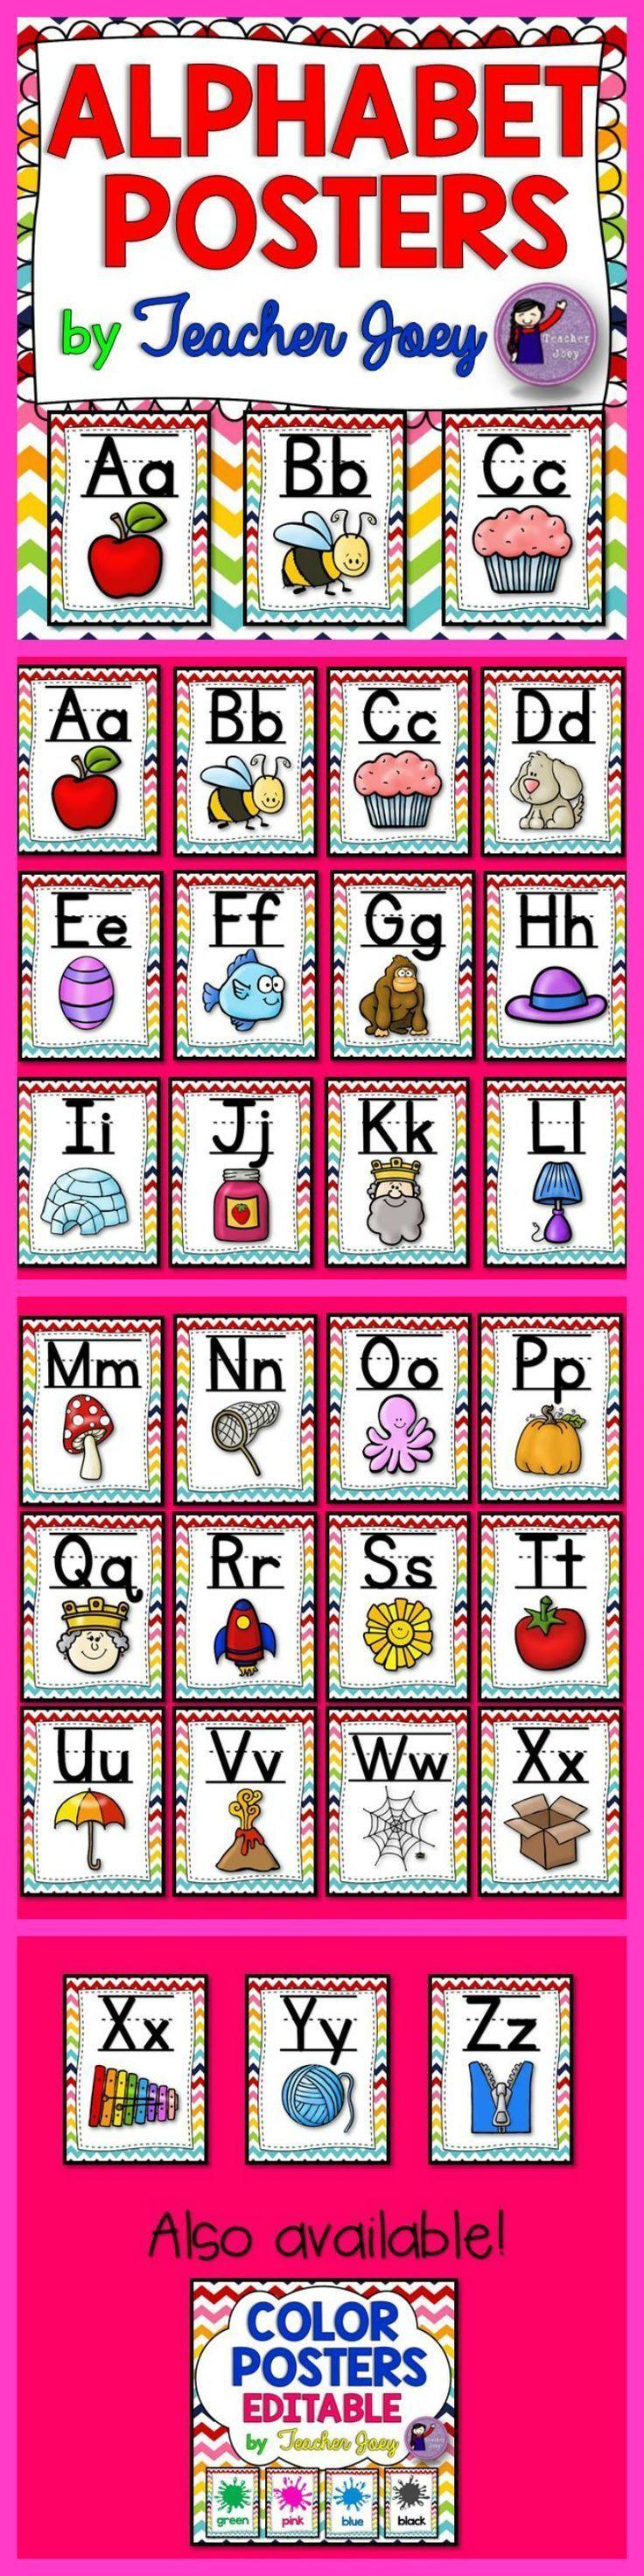 Alphabet Posters Rainbow Chevron background #teacherspayteachers #tpt